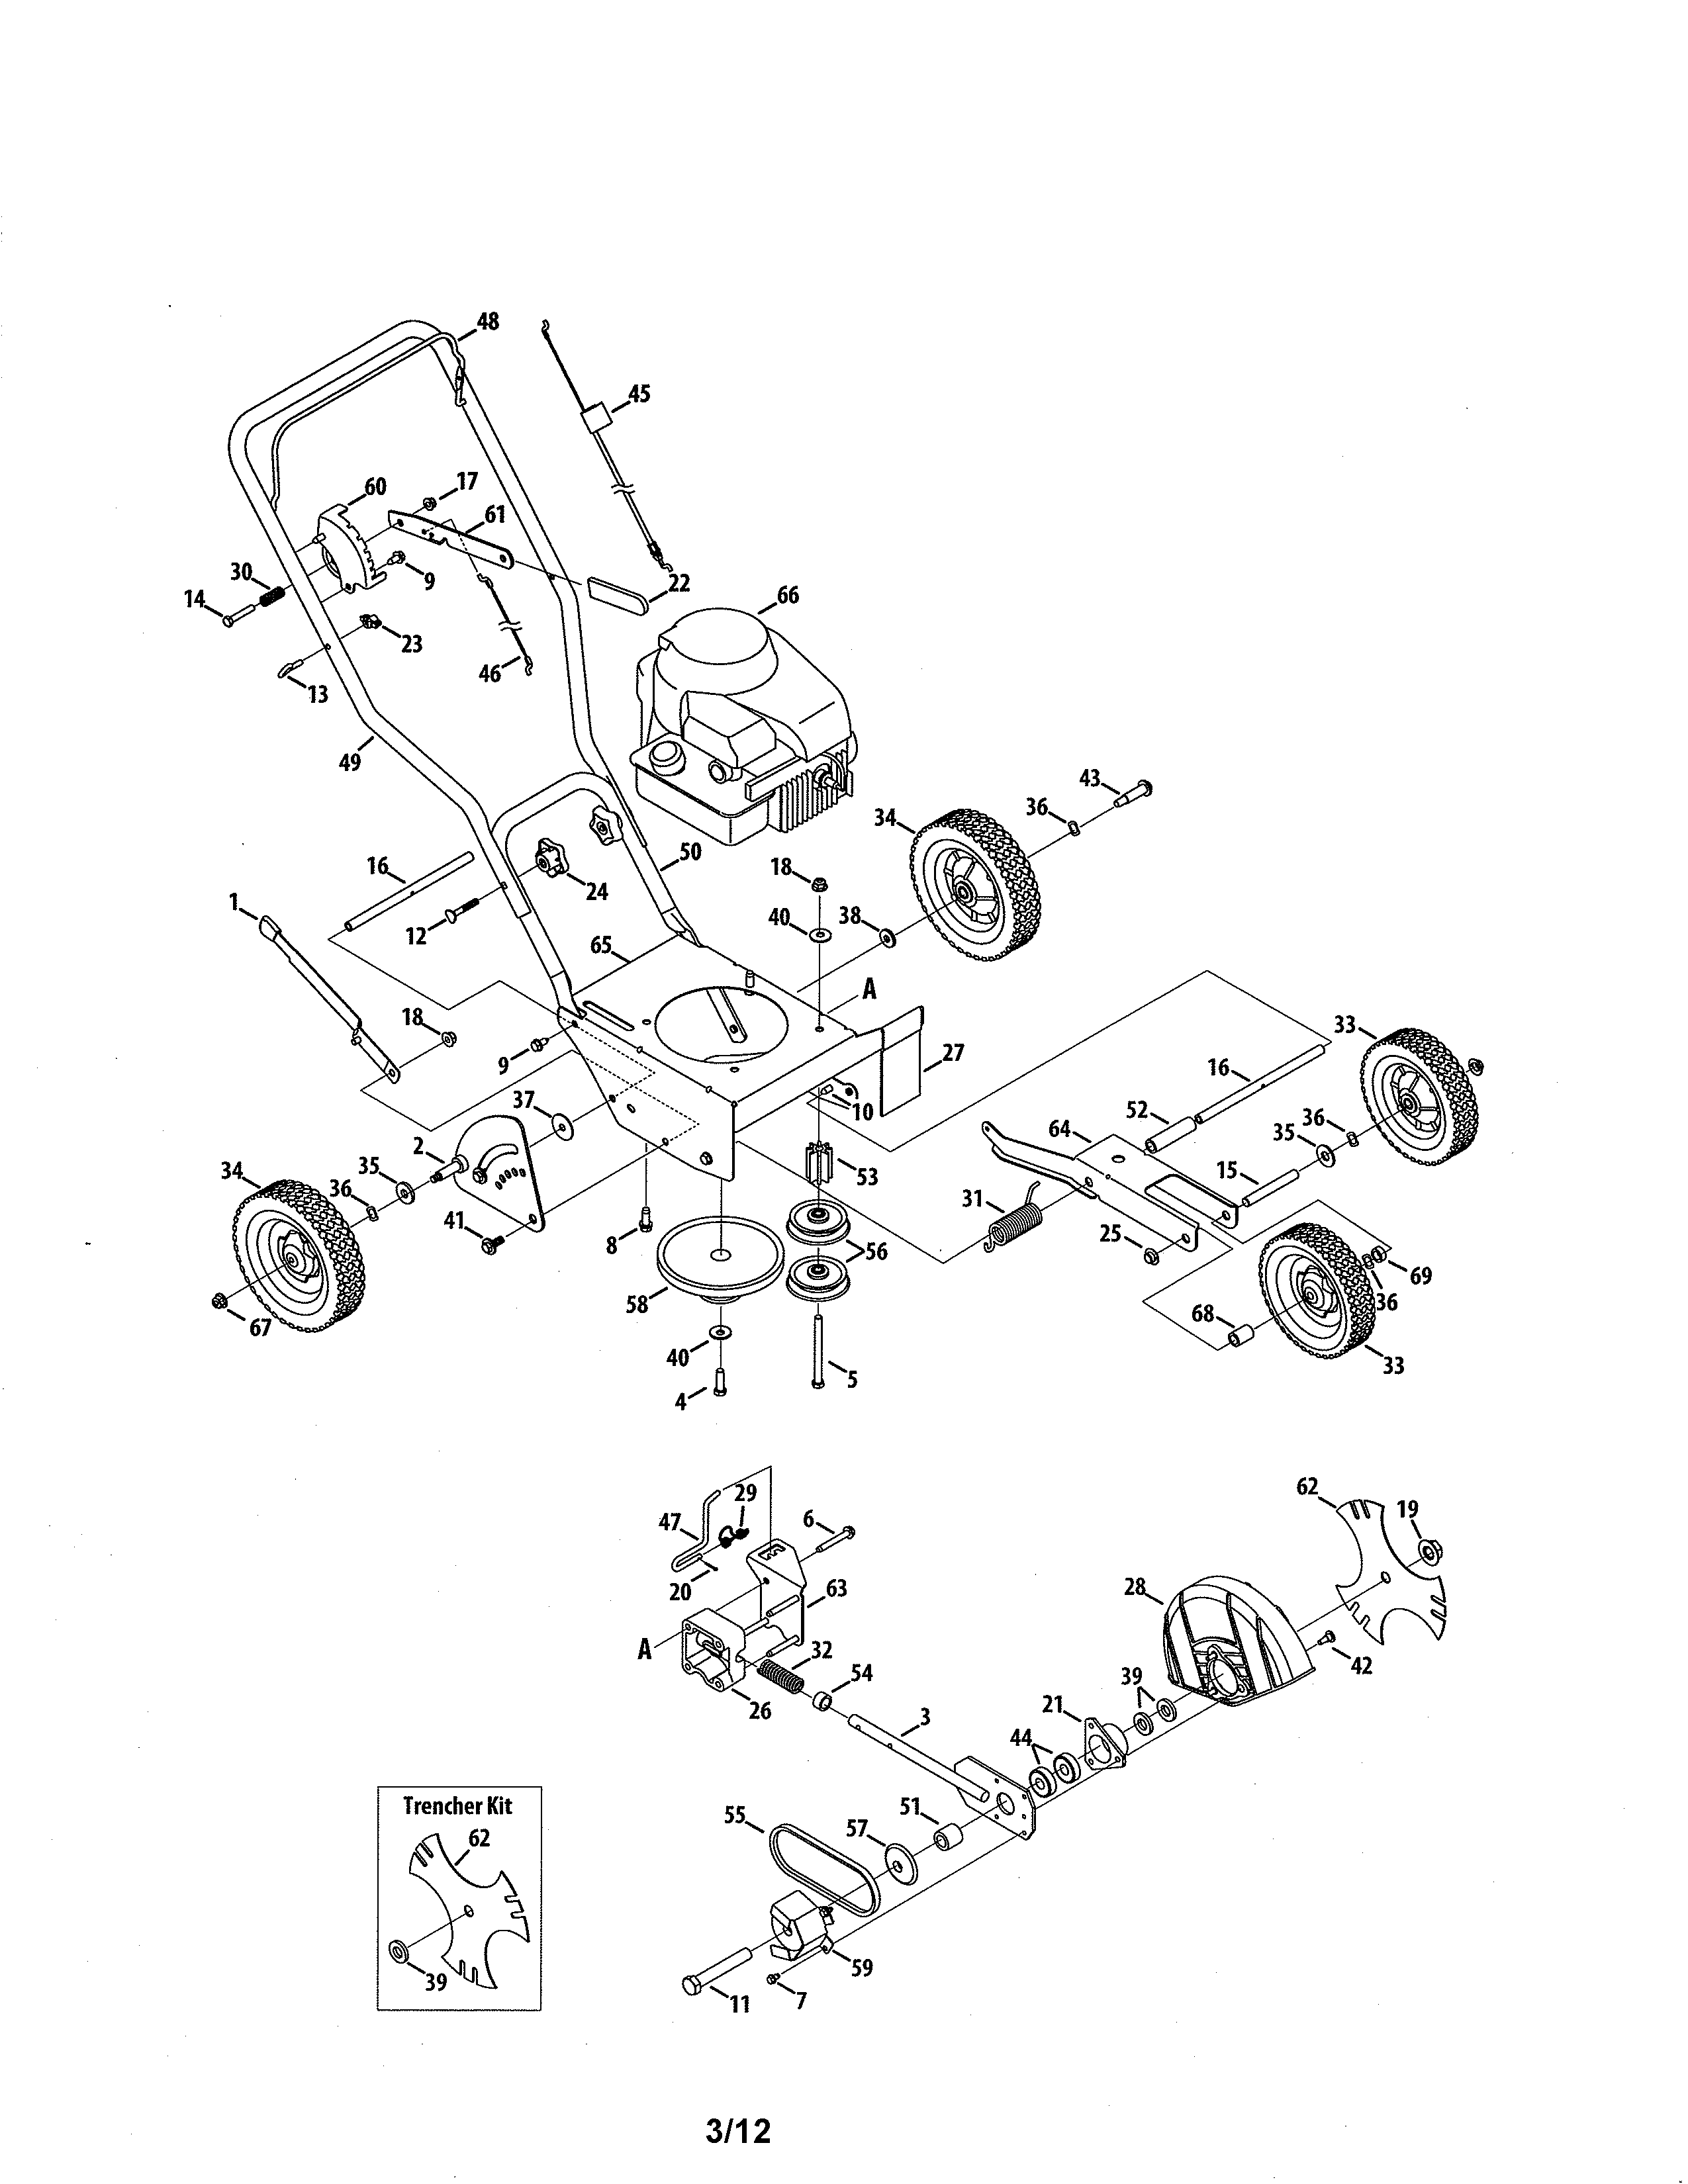 Mtd  Edger/Trencher  Lawn mower